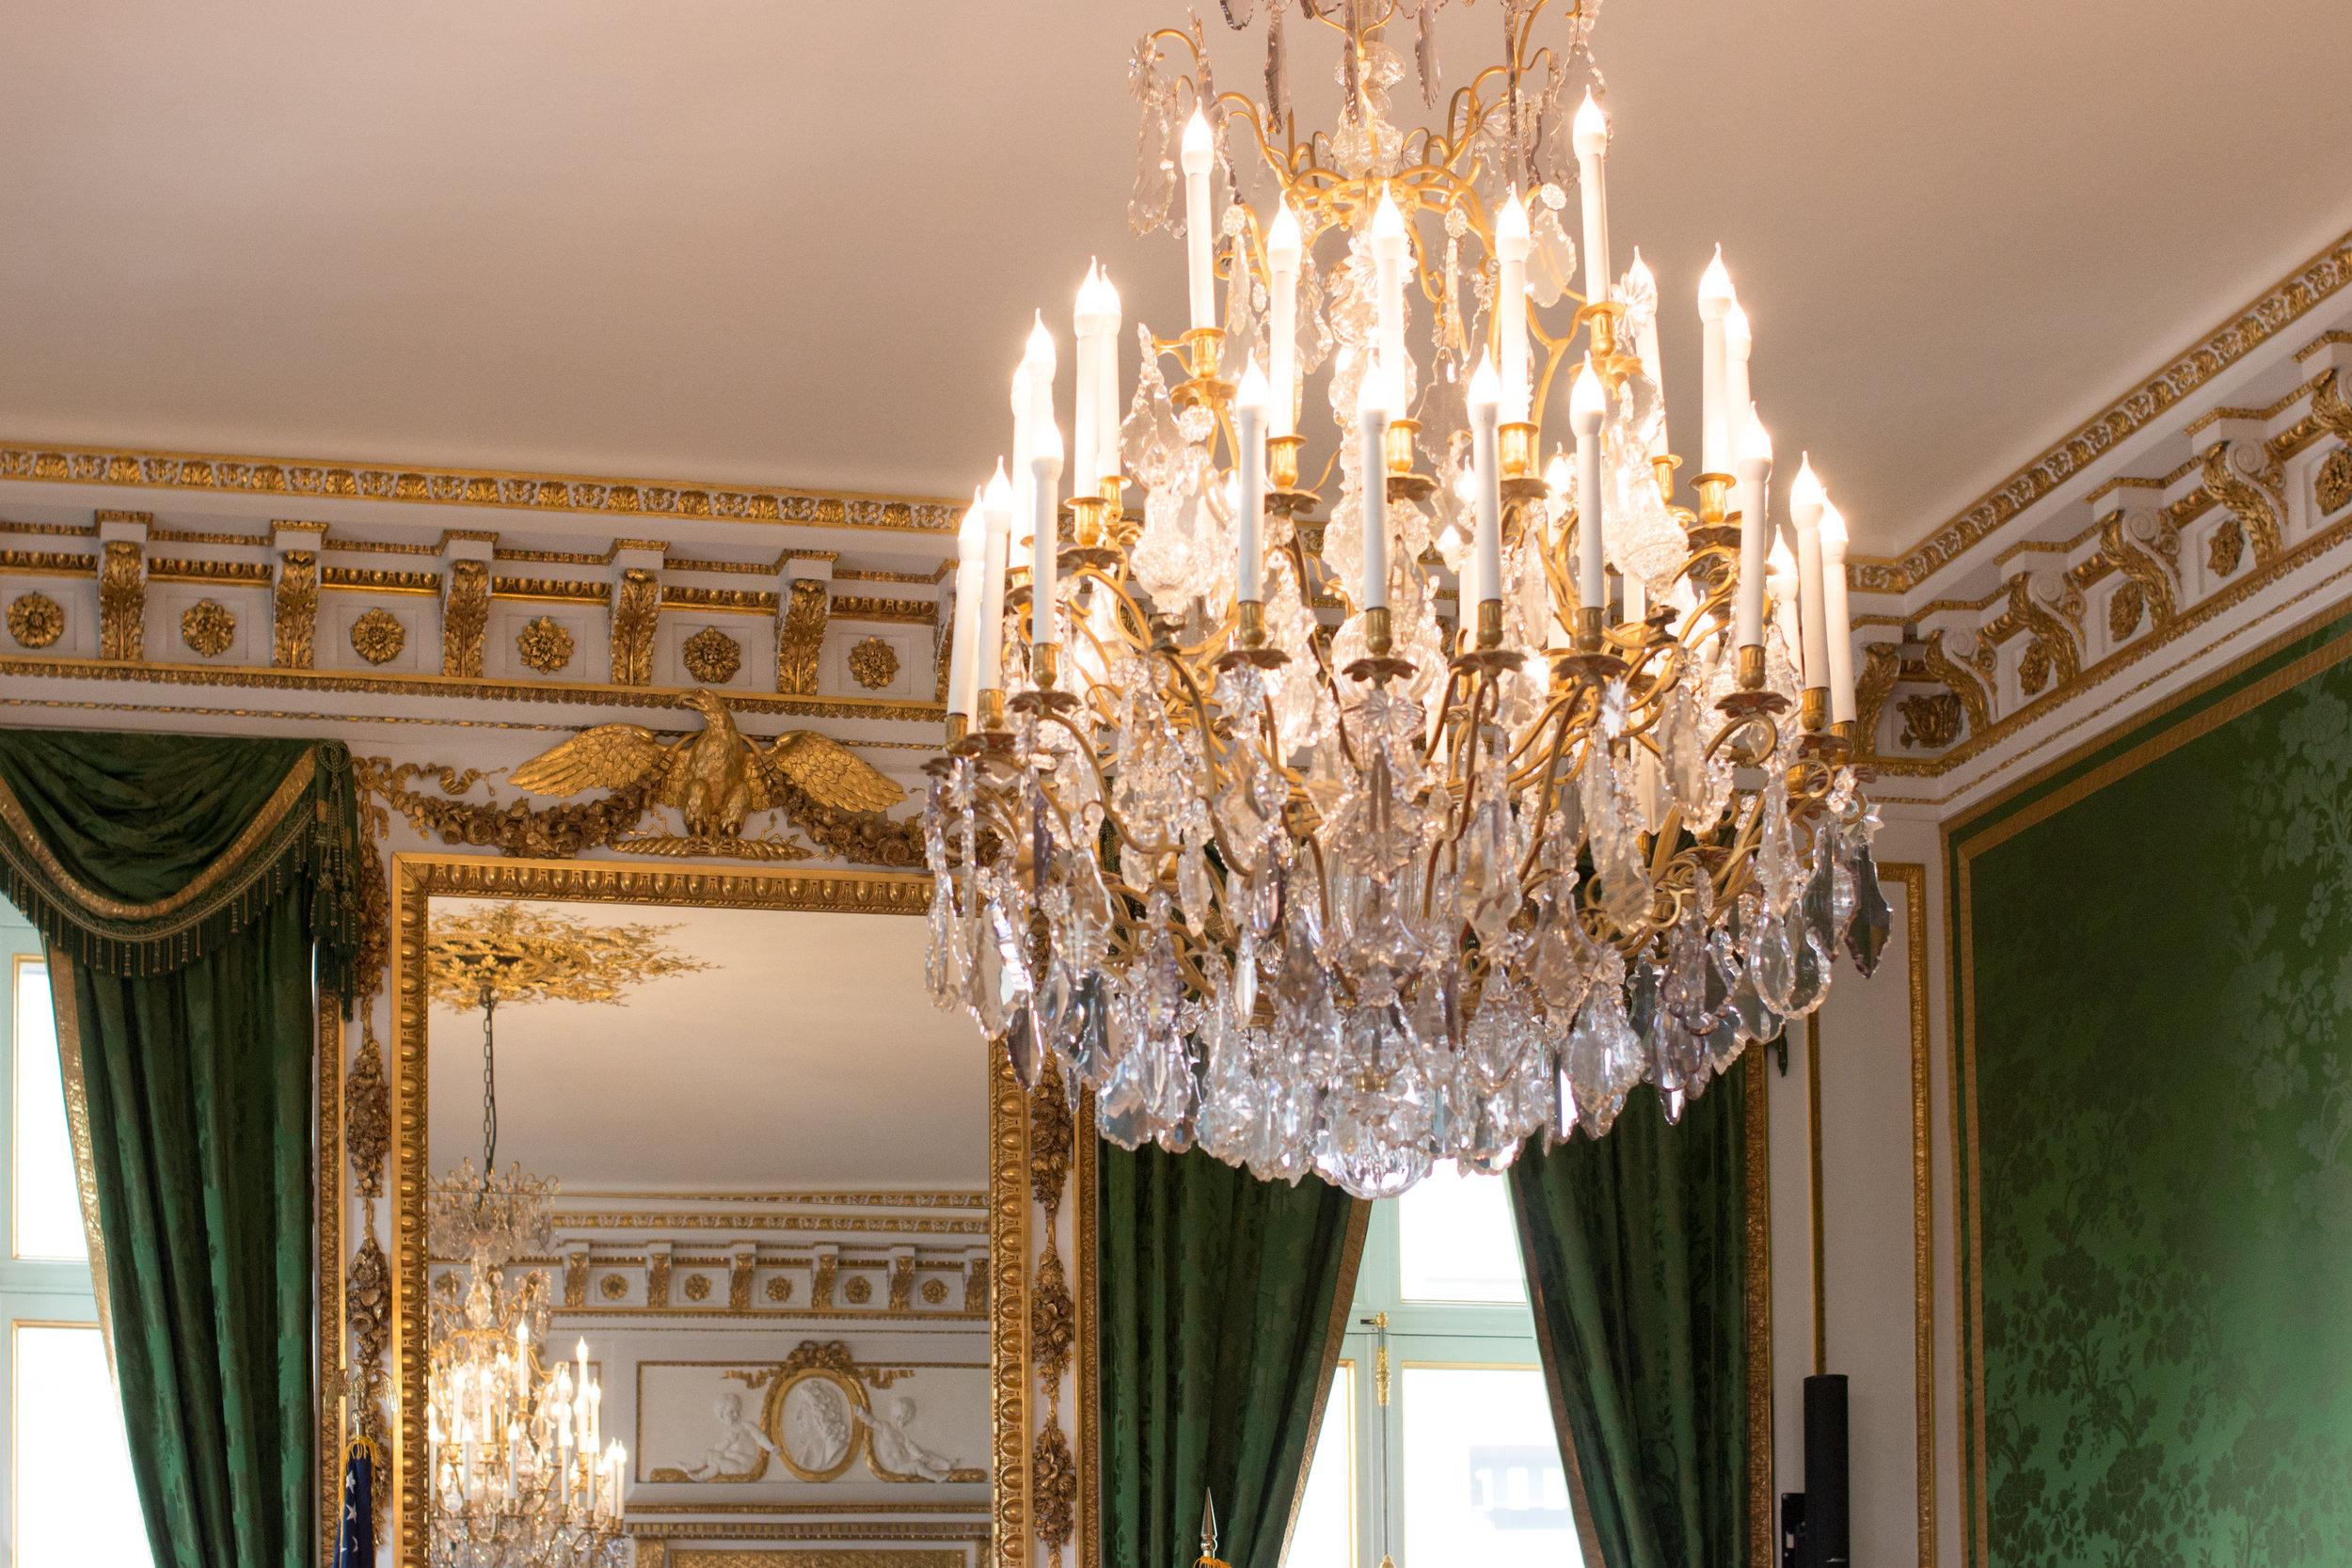 hôtel de talleyrand heritage days paris, france